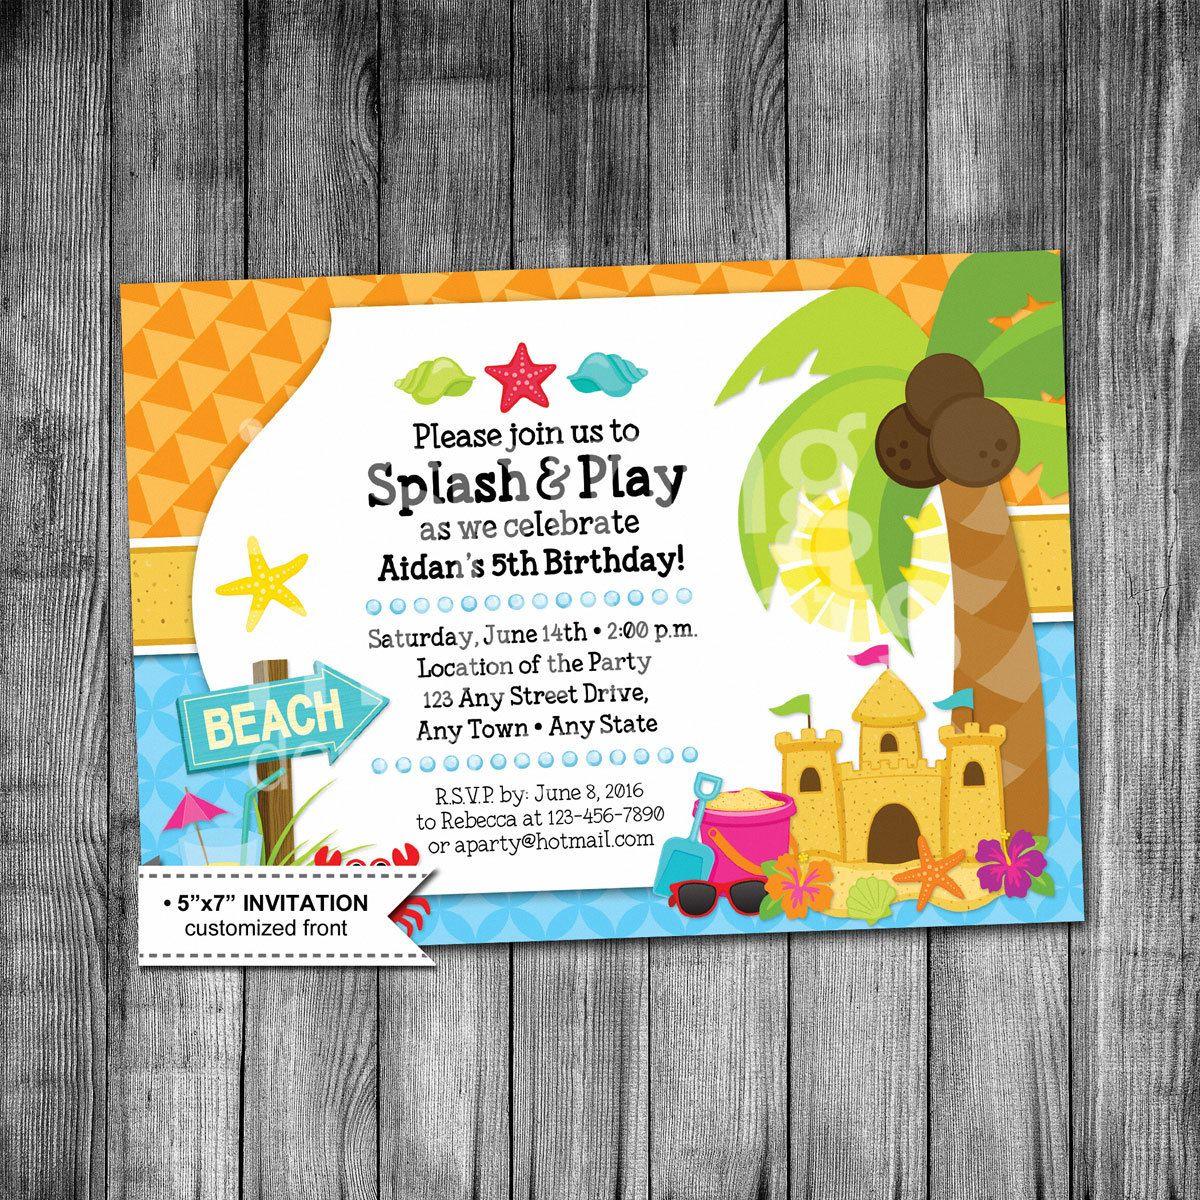 free printable camouflage birthday party invitations%0A Kids Beach Birthday Invitation   Beach Party Invitation   Sandcastle    Shells   Starfish   Crab